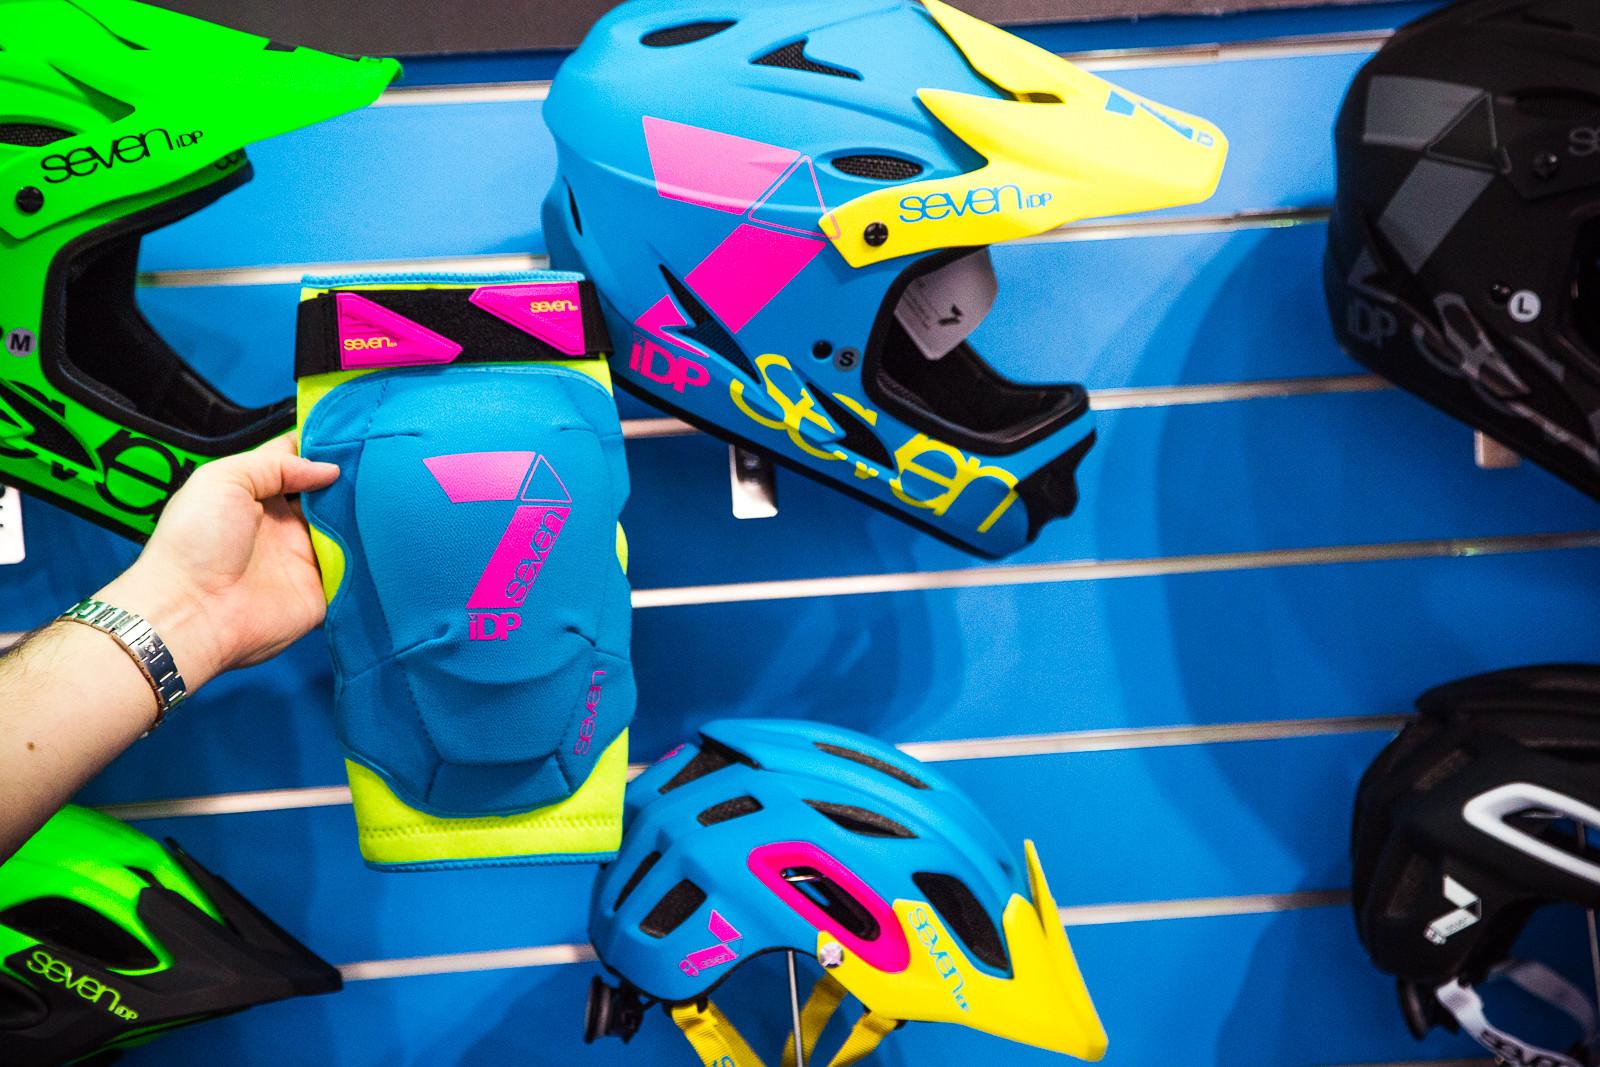 7iDP Helmets and Protection - 2016 Taipei Bike Show - Mountain Biking Pictures - Vital MTB